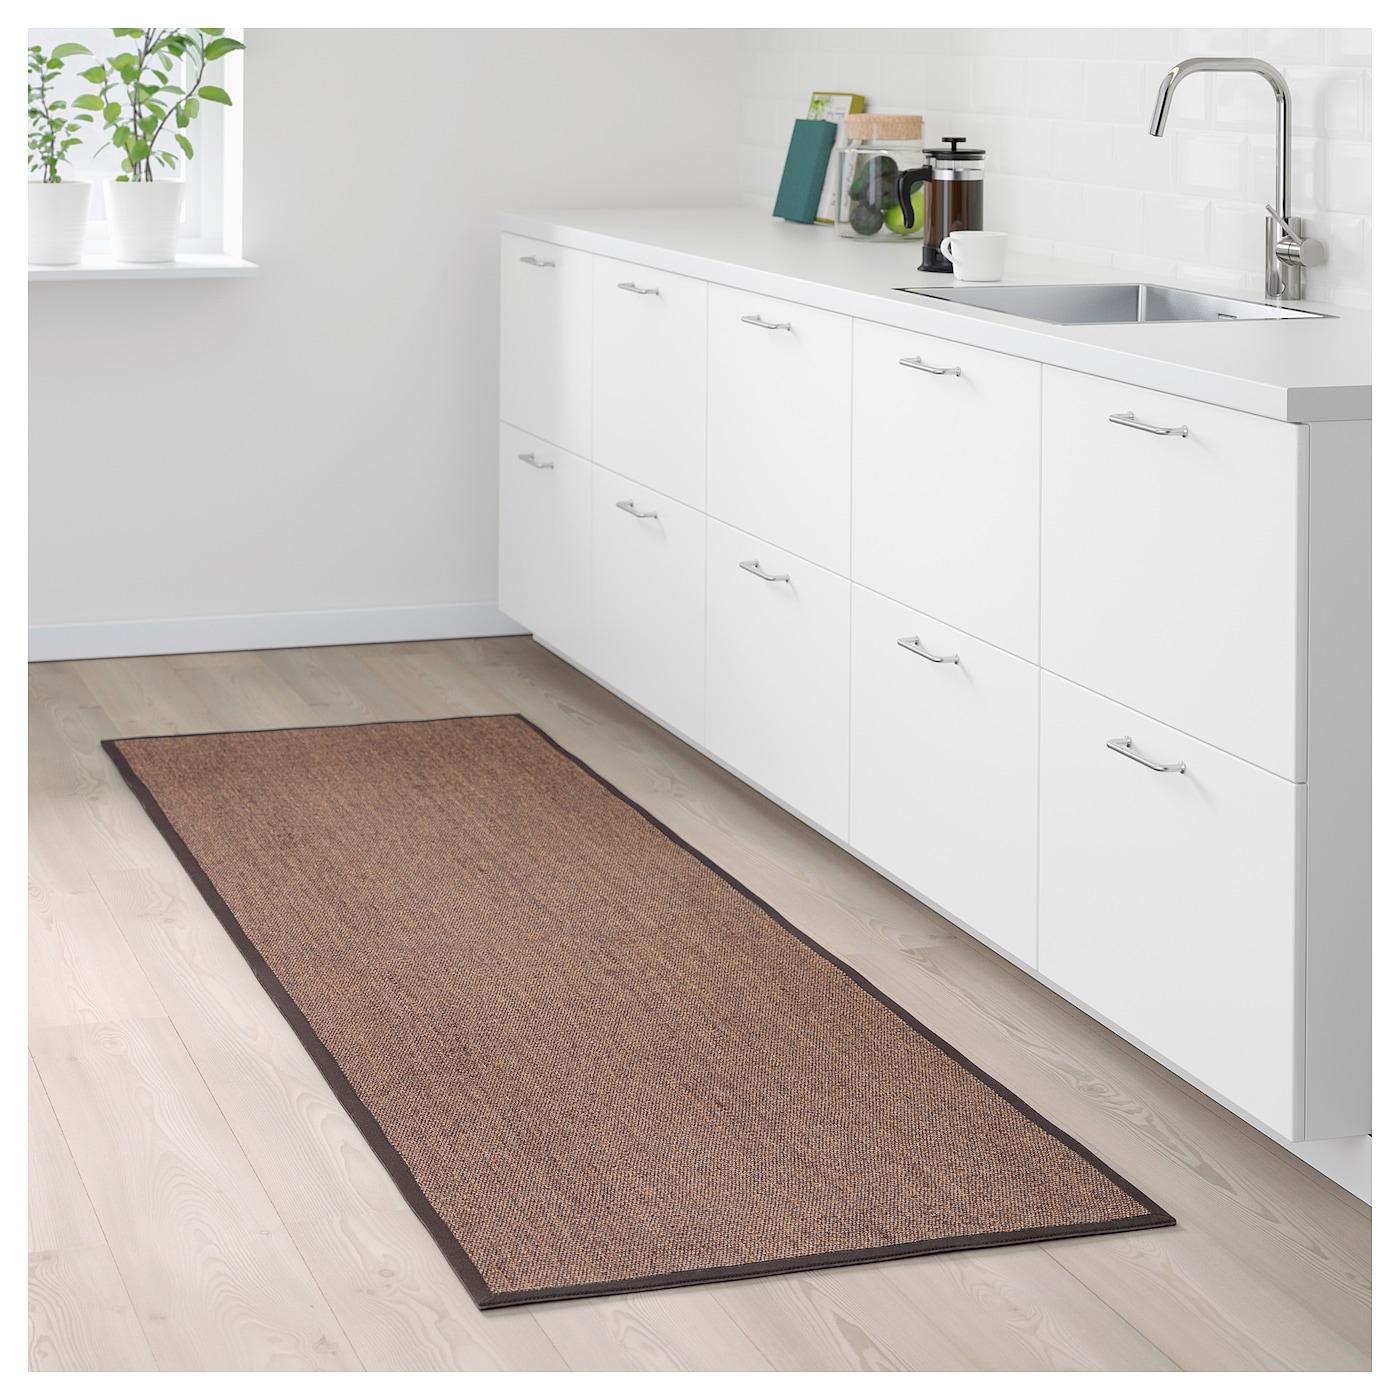 Ikea Rug Felt: OSTED Rug, Flatwoven Brown 80x240 Cm